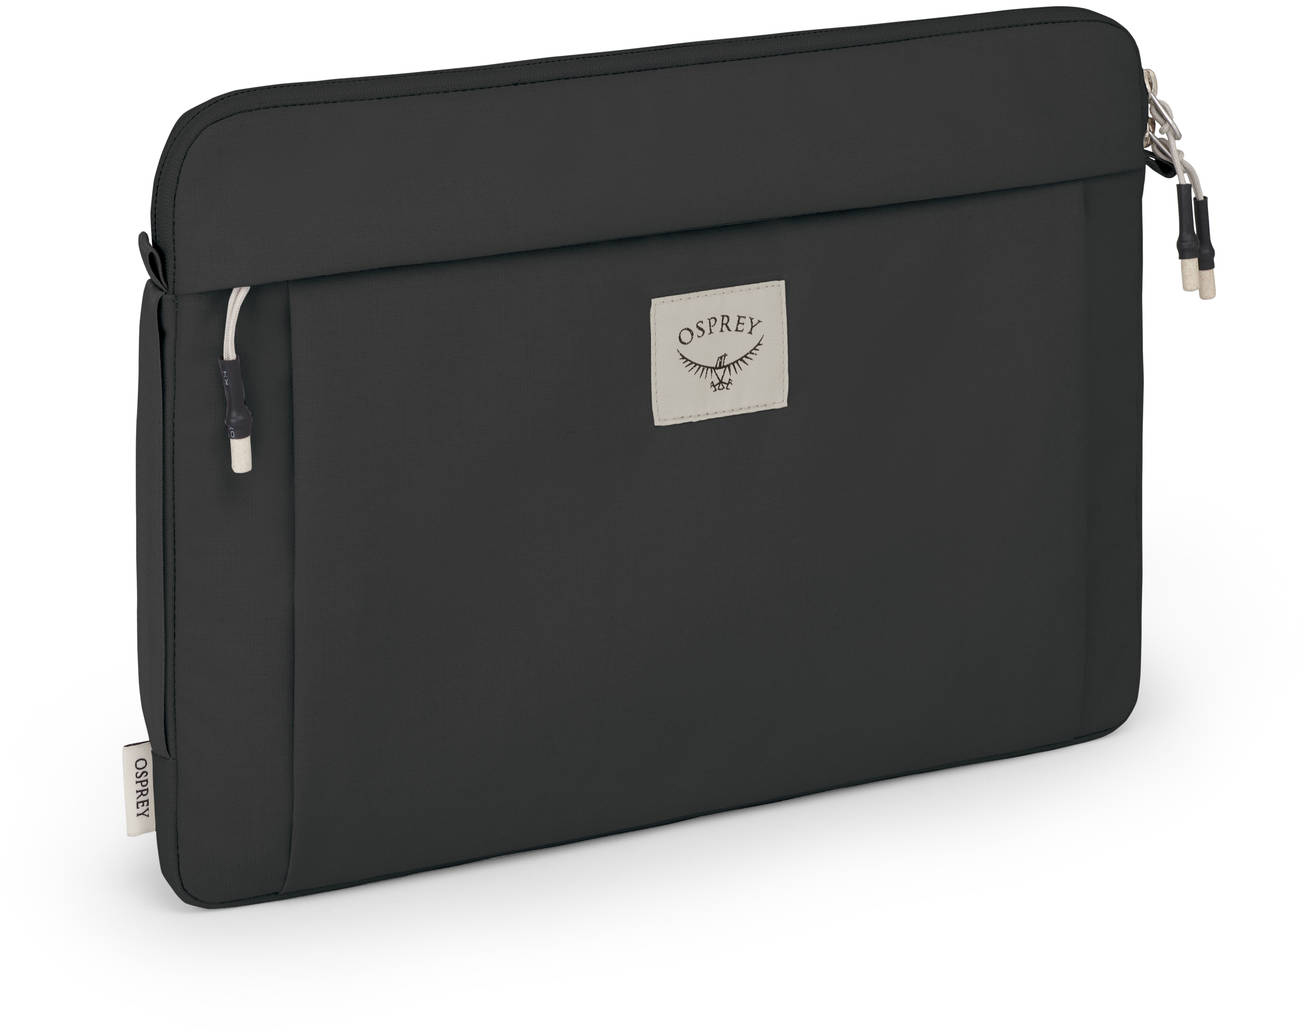 Аксессуары Чехол для ноутбука Osprey Arcane Laptop Sleeve 15 Stonewash Black Arcane_Laptop_Sleeve_15_S20_Side_Stonewash_Black_web.jpg